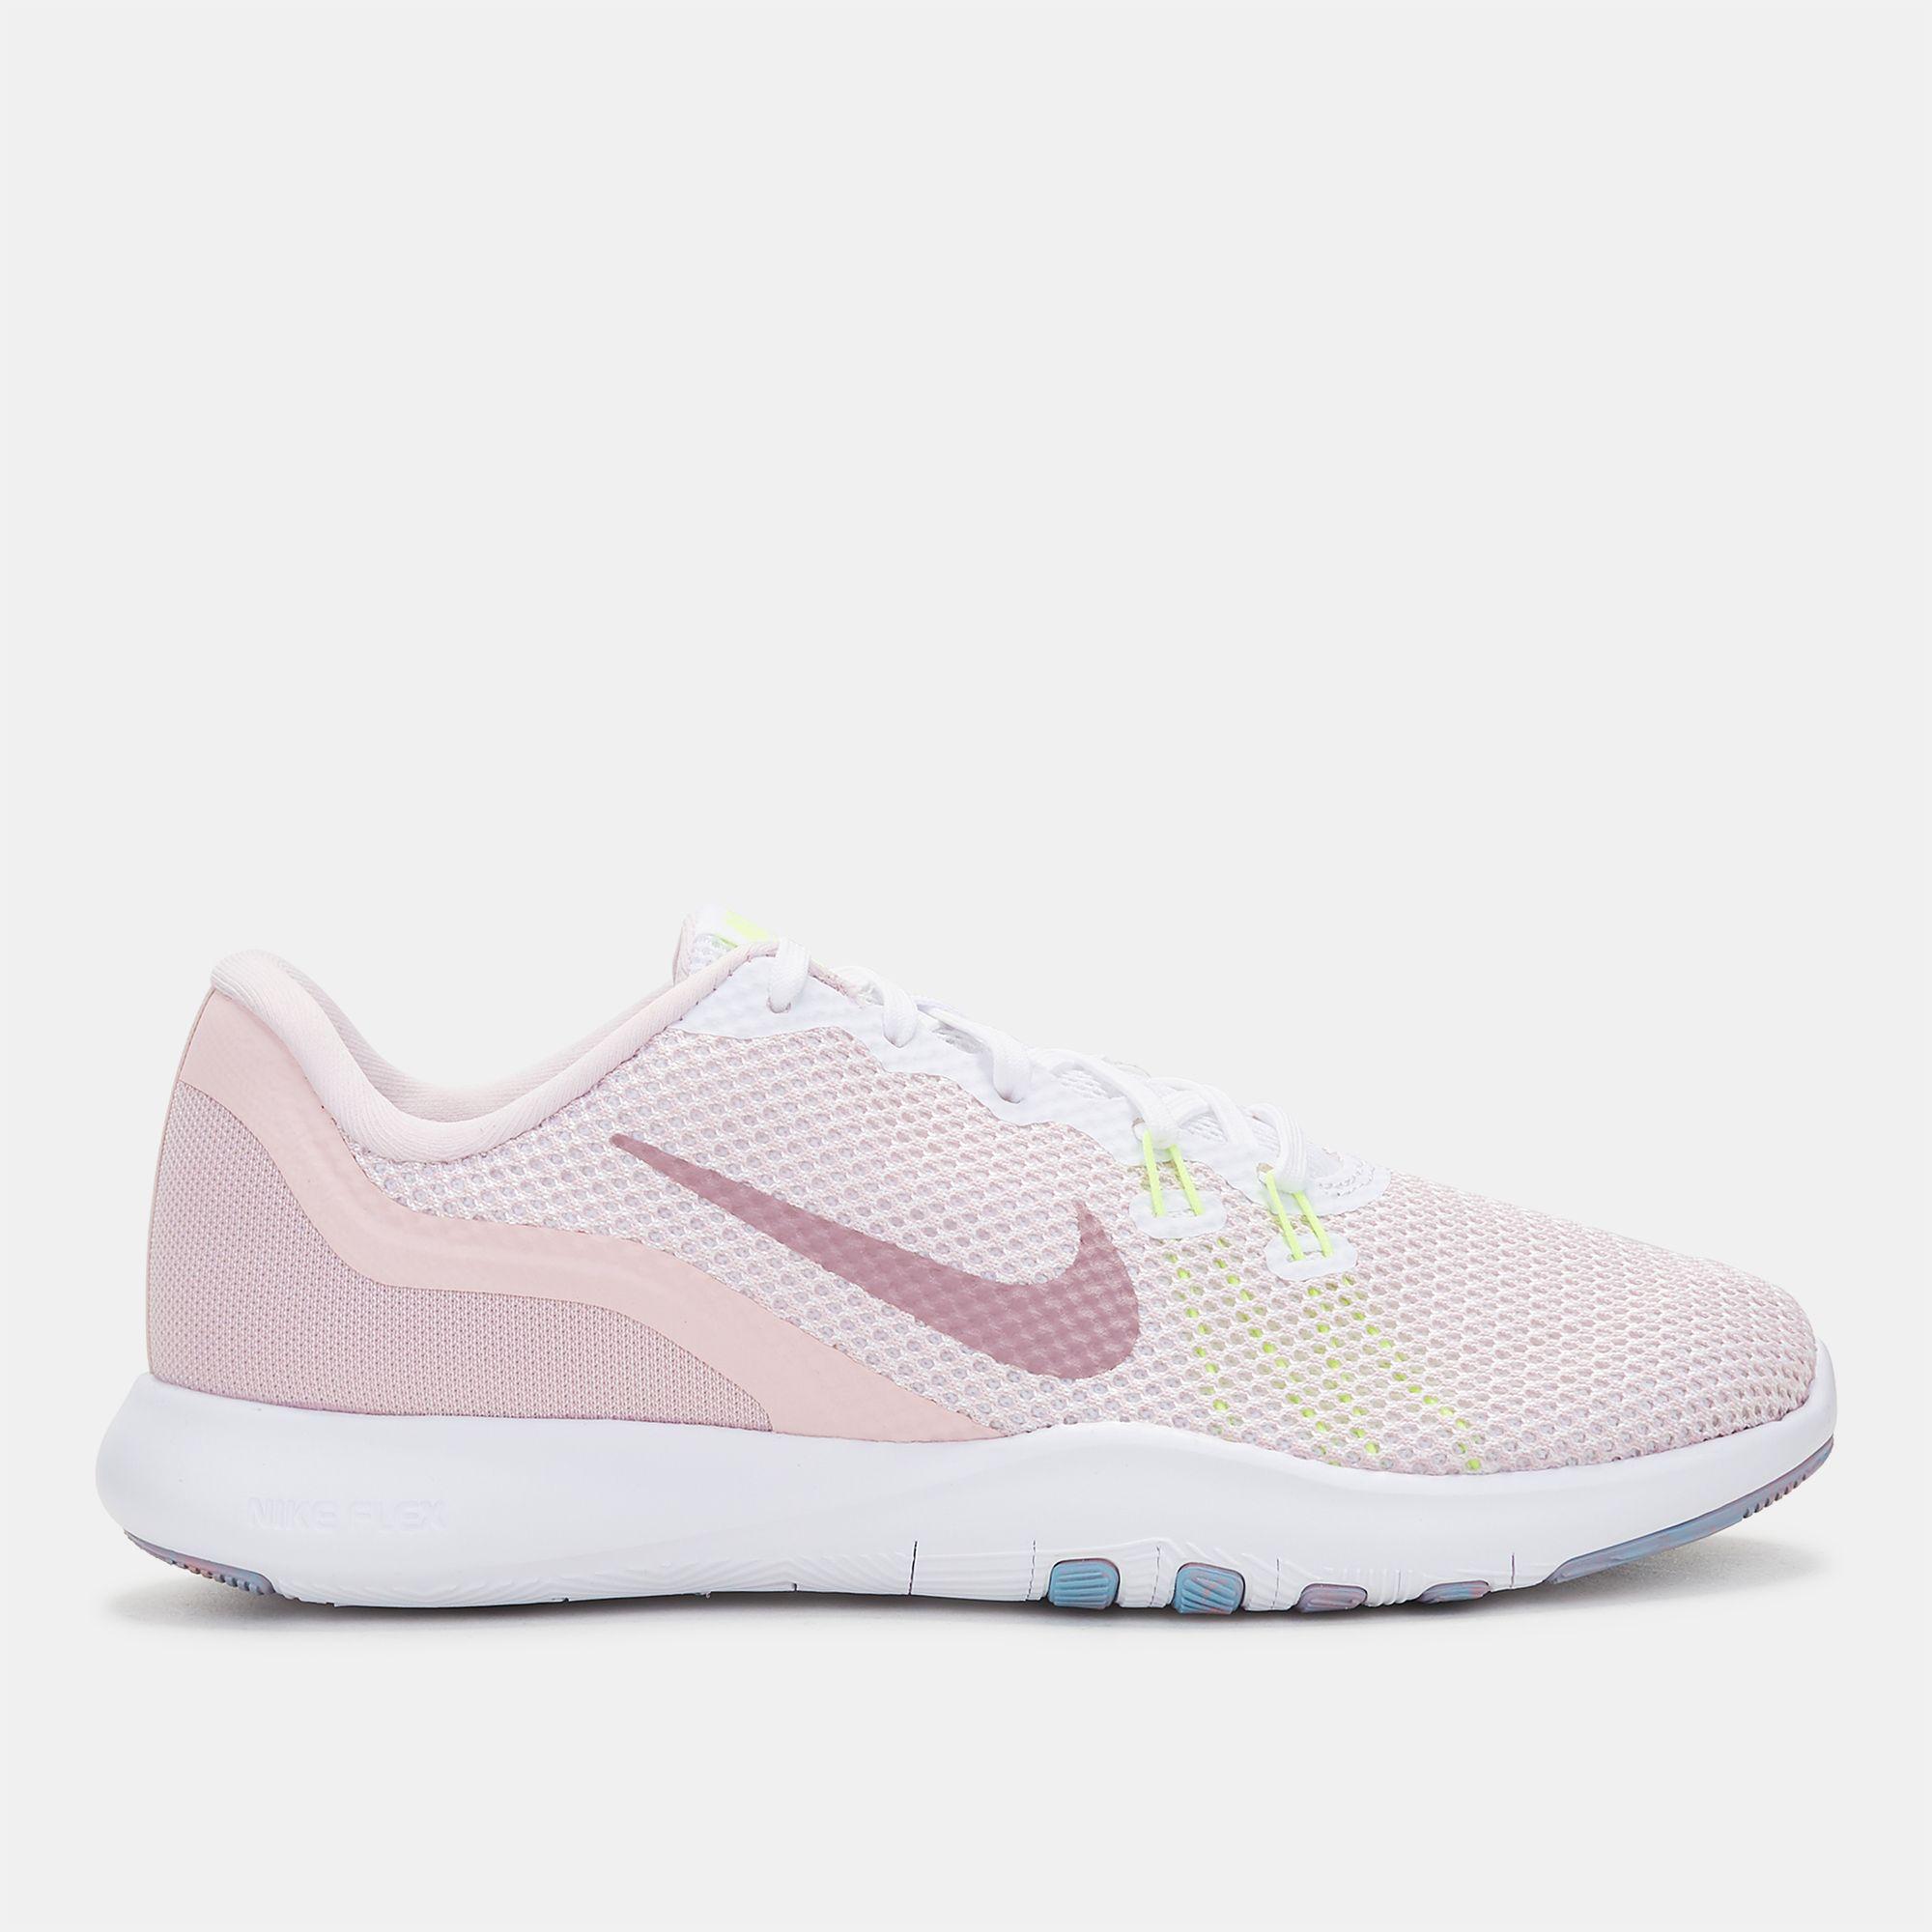 aa48be0d4e4 Shop white nike flex trainer training shoe for womens nike sss jpg  2000x2000 Nike flex trainer